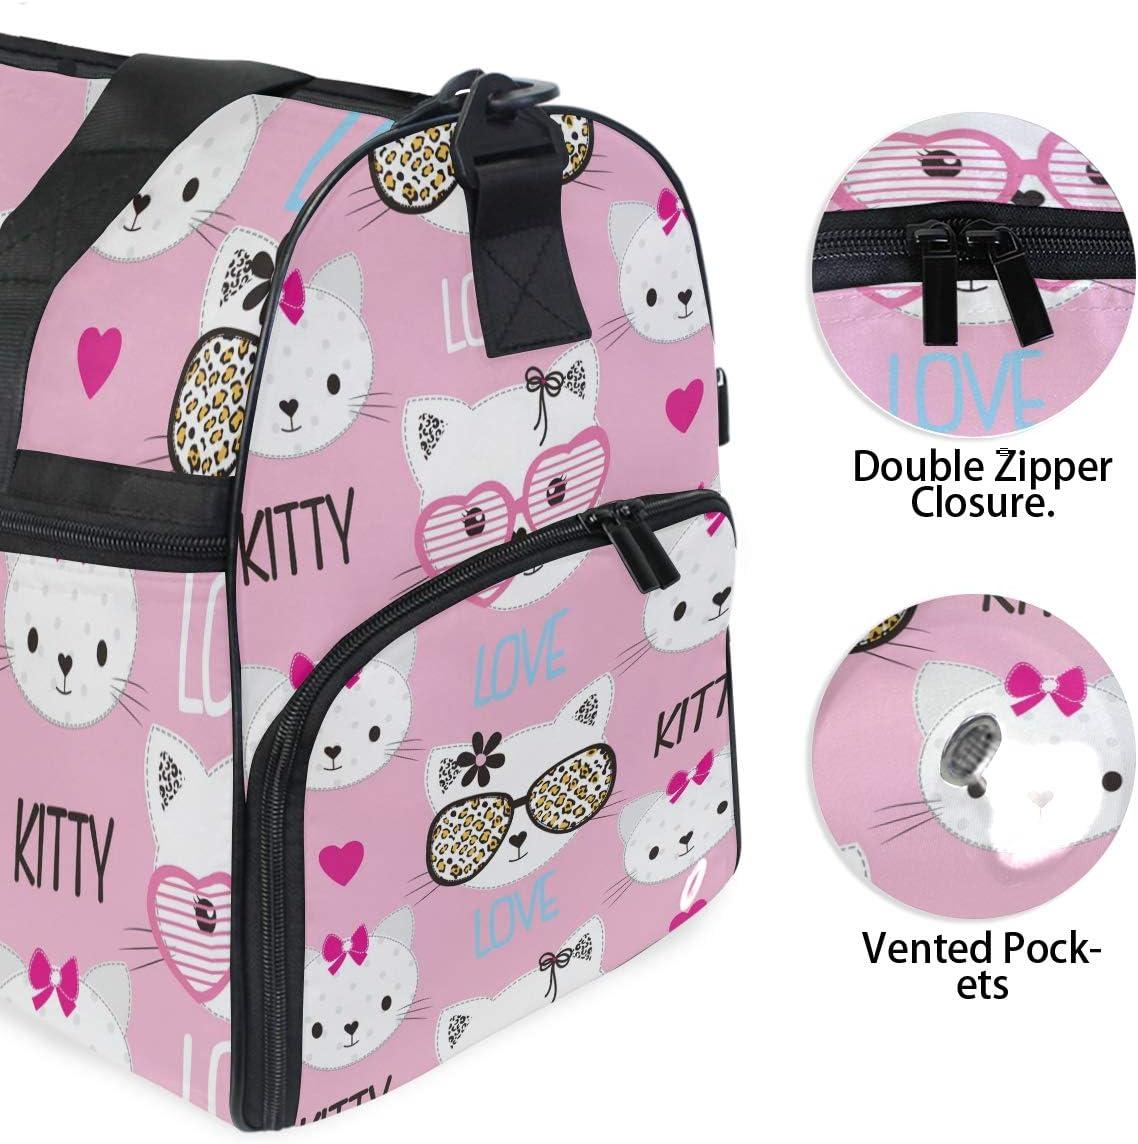 ALAZA Childish Pink Cats Emoji Sports Gym Duffel Bag Travel Luggage Handbag Shoulder Bag with Shoes Compartment for Men Women